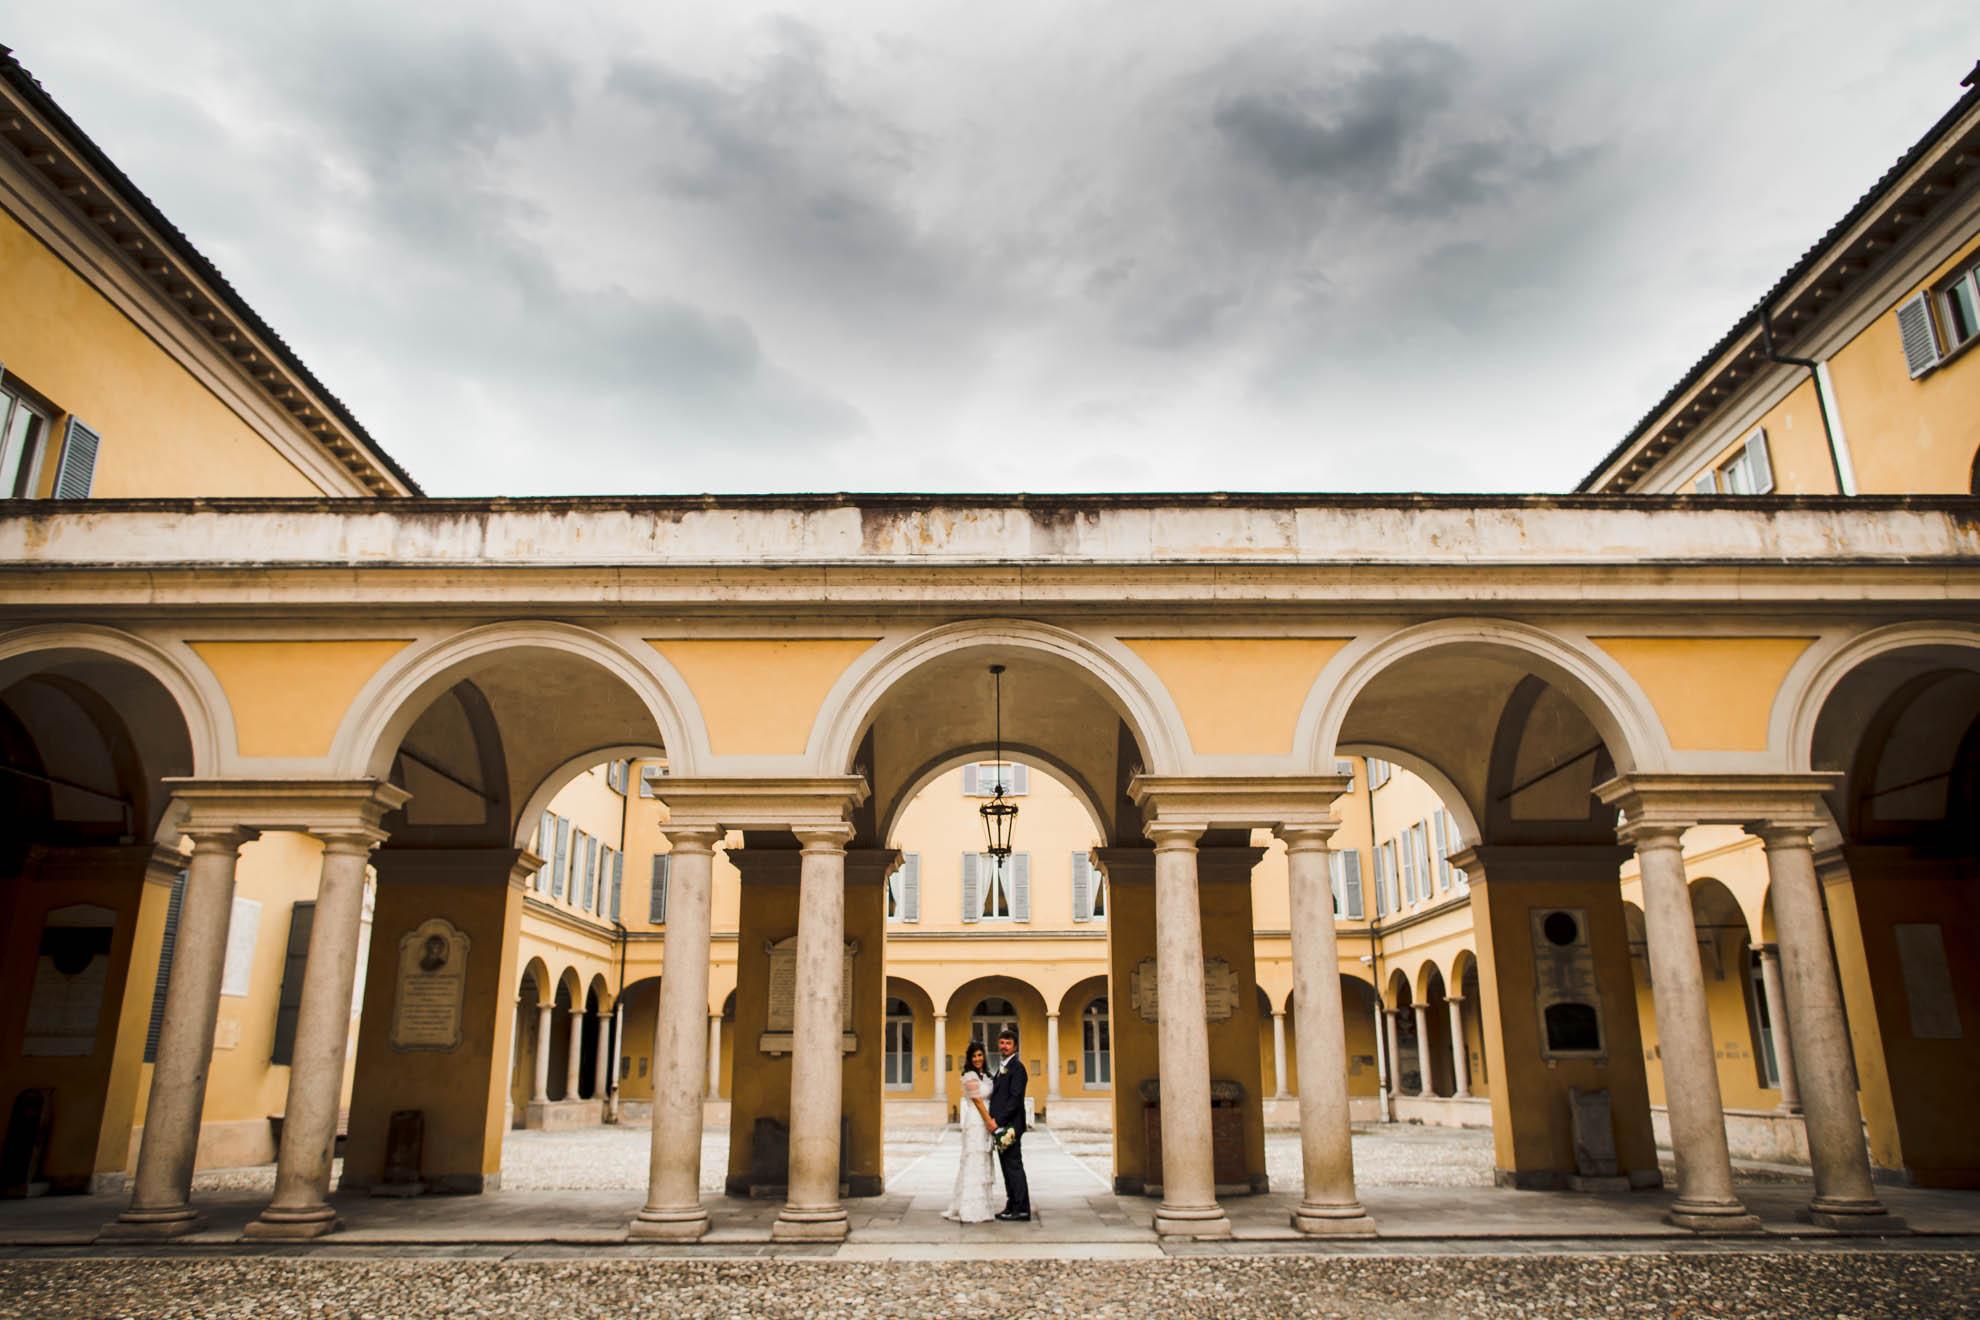 016 Fotografo per Matrimonio Diego Ravenna Pavia_MG_8019-Modifica